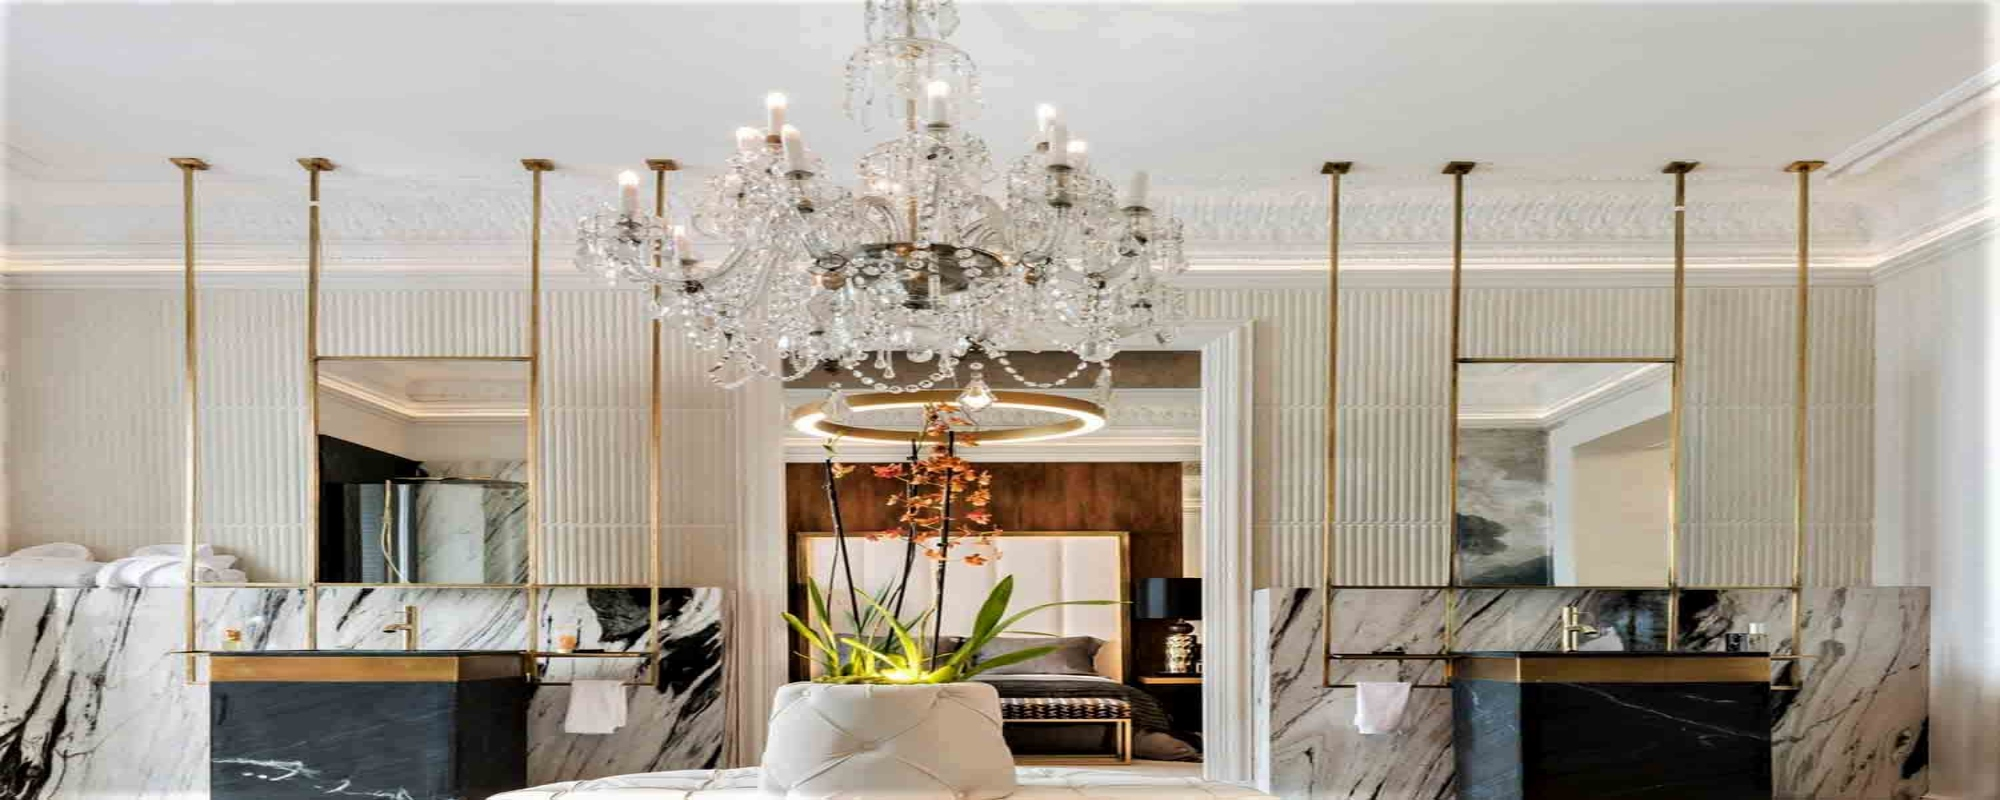 Top Interiorista: Fran Cassinello crea proyectos de diseño lujuosos top interiorista Top Interiorista: Fran Cassinello crea proyectos de diseño lujuosos Featured 4